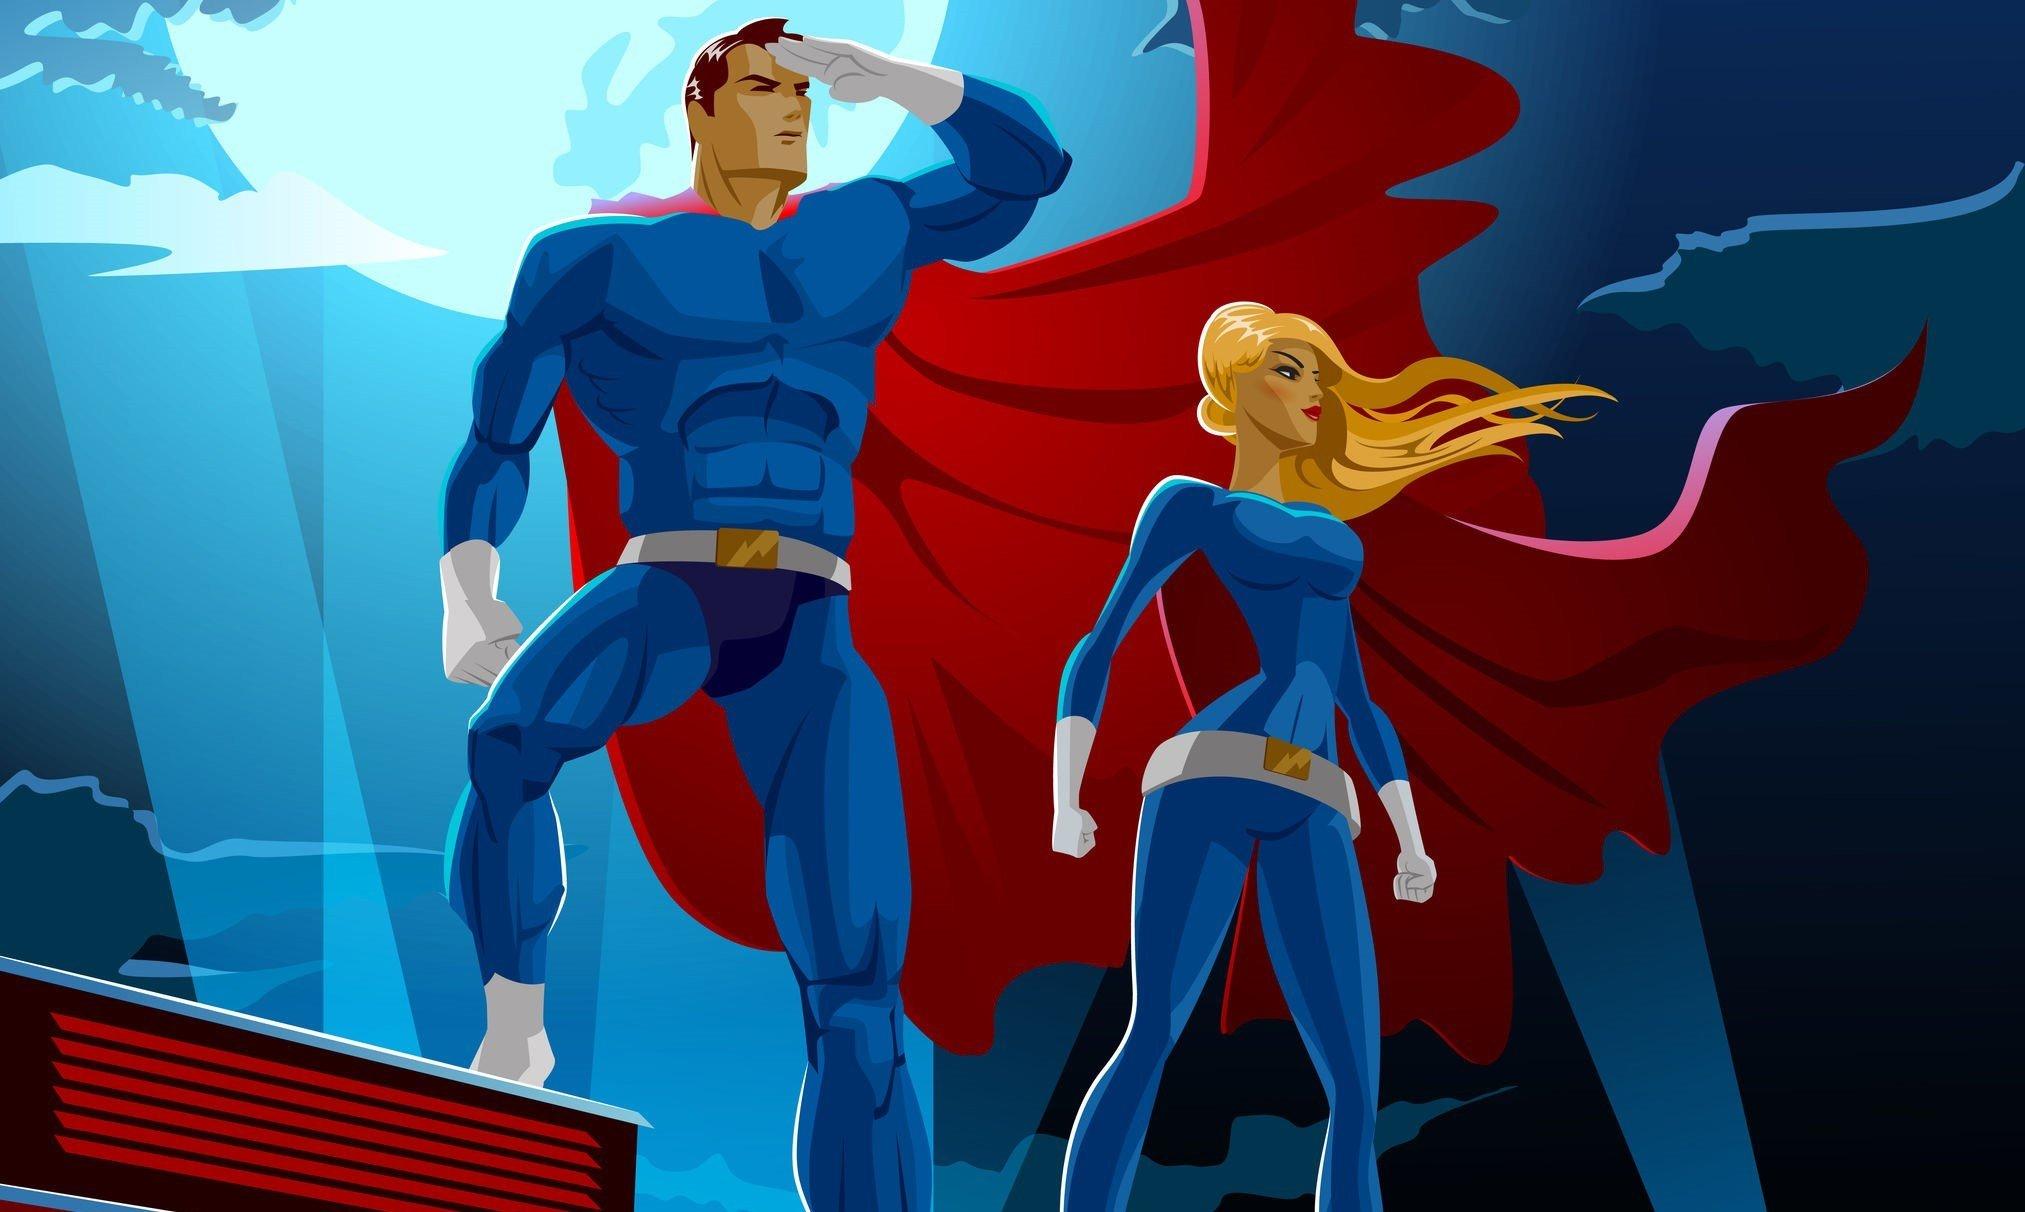 Superhero Couple. Male and female superheroes. Cloudy sky.